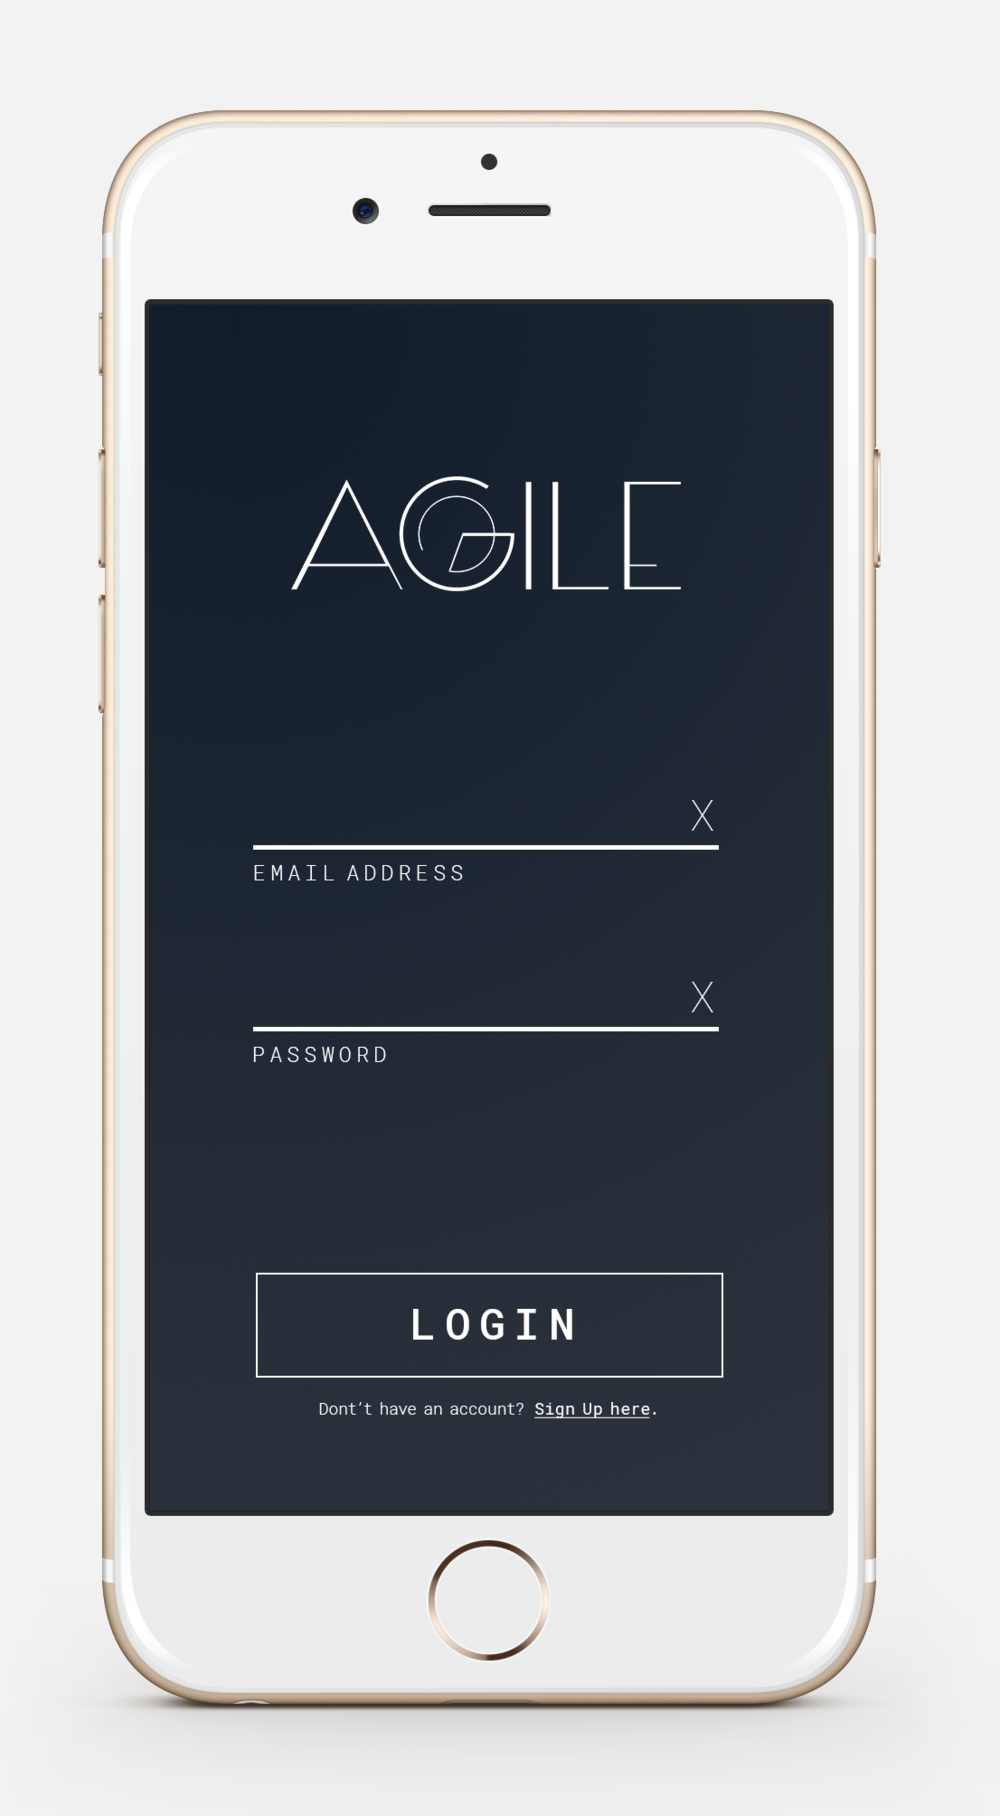 agile-intro-login.png